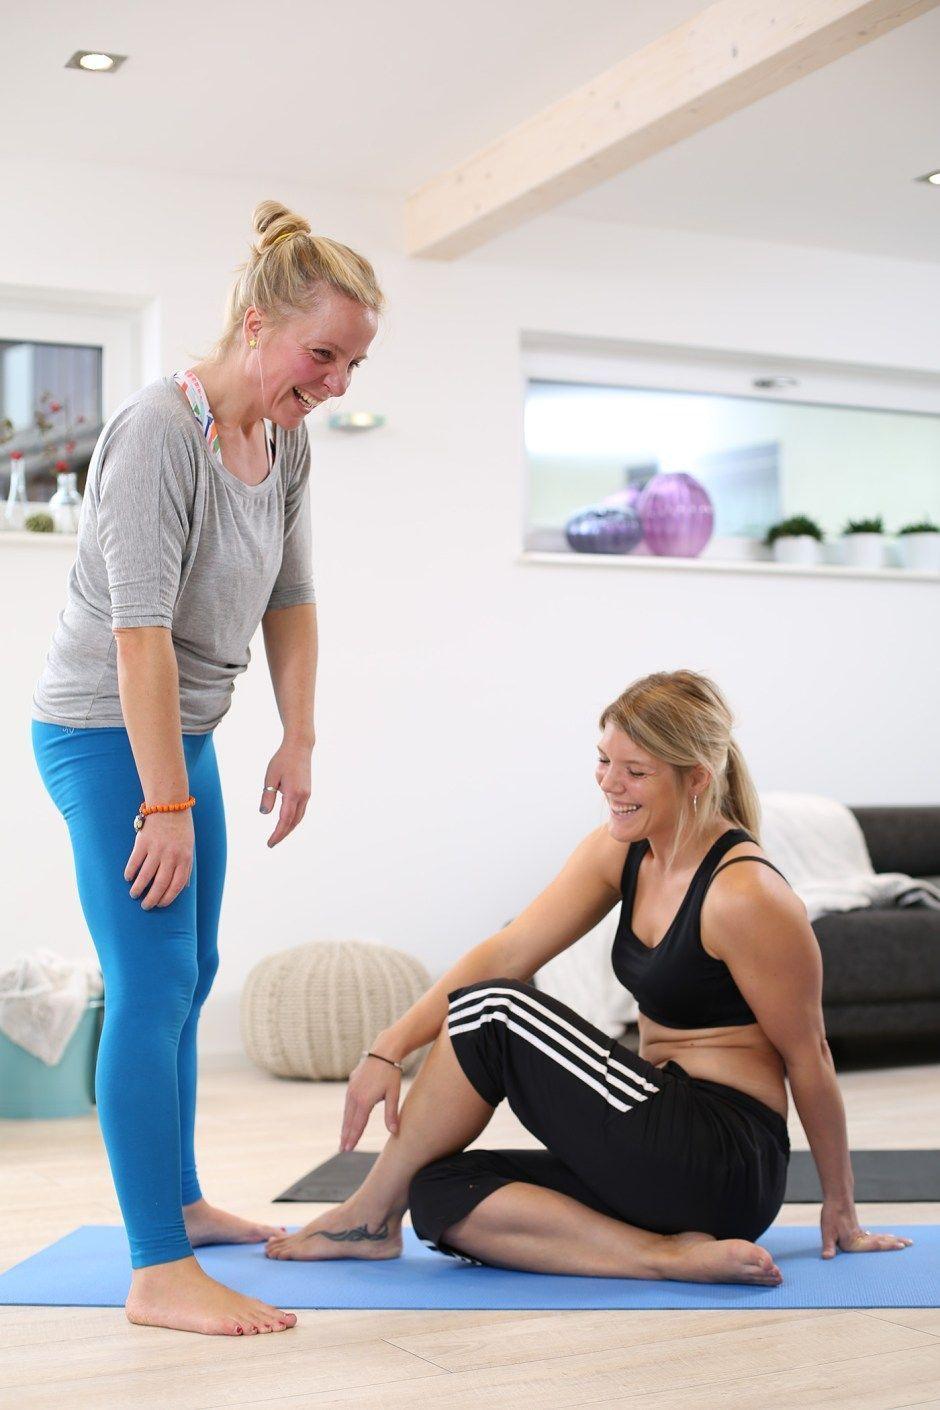 #Candy #fitness #kurze workouts für zu hause #Personal #rules #Schwedler #Successful #training Seven...